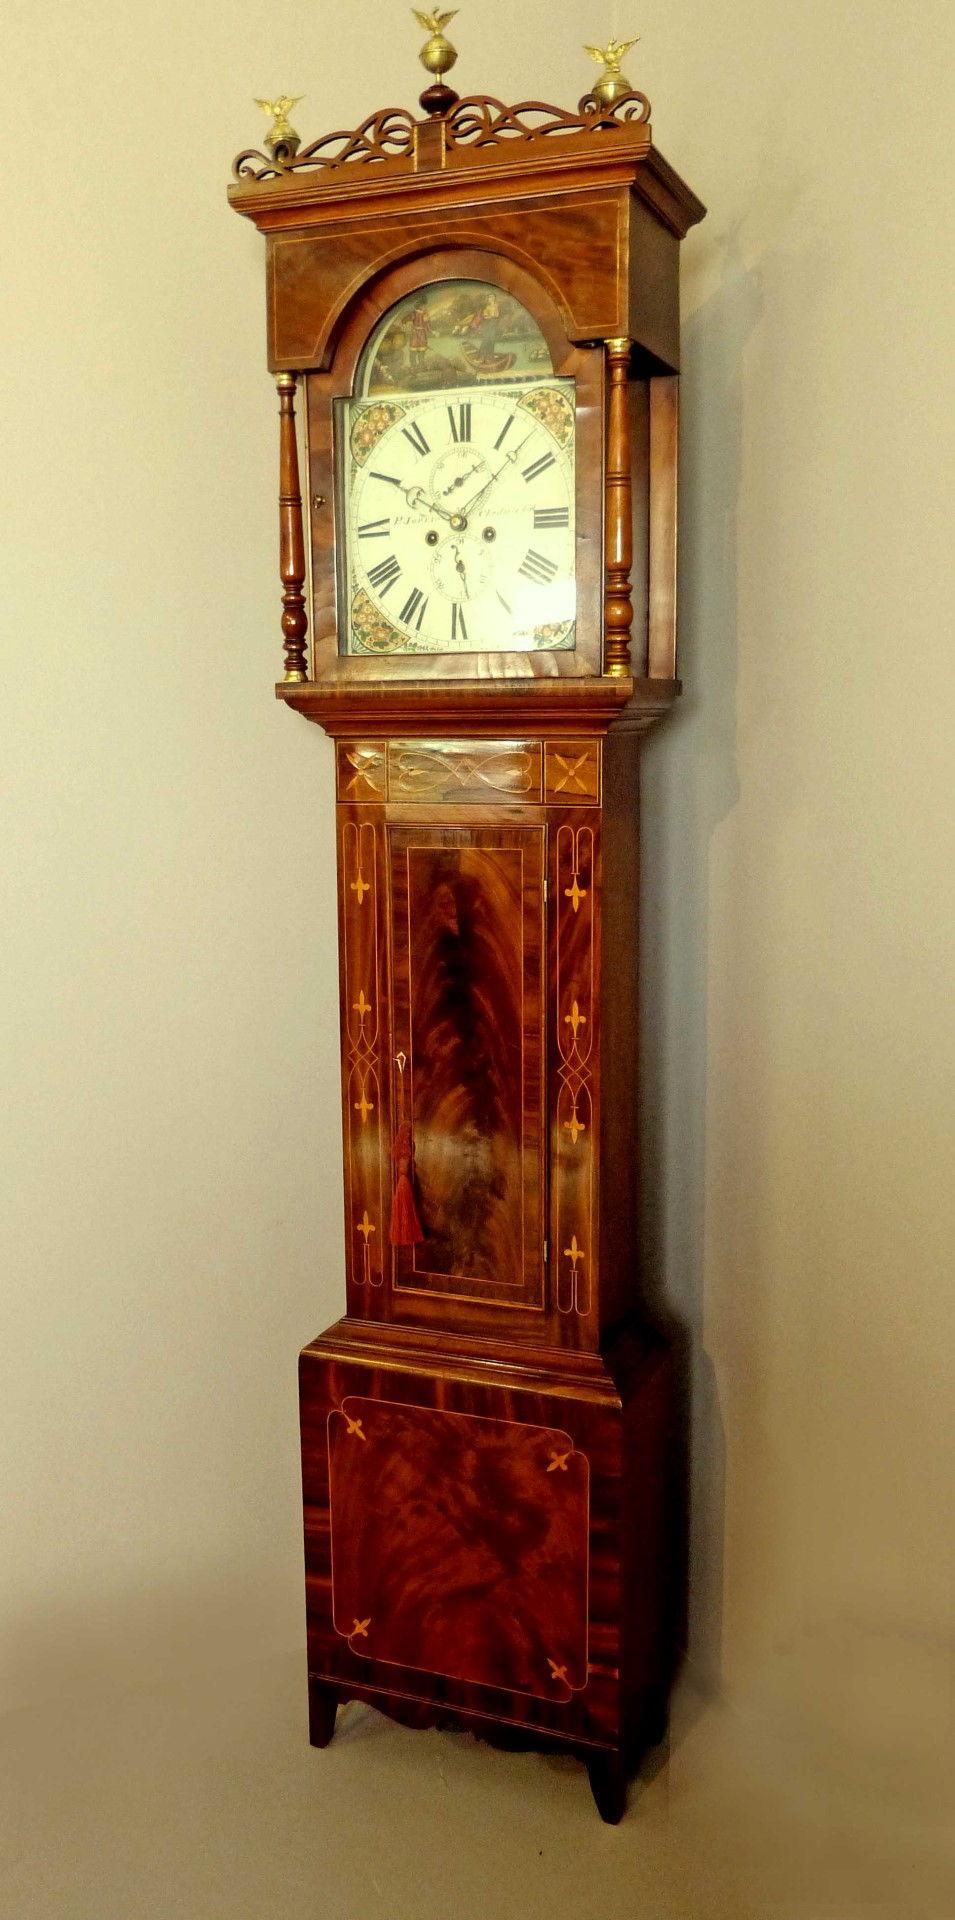 Relojes Antiguos Ofertas De Relojes Antiguos Relojería Antigua